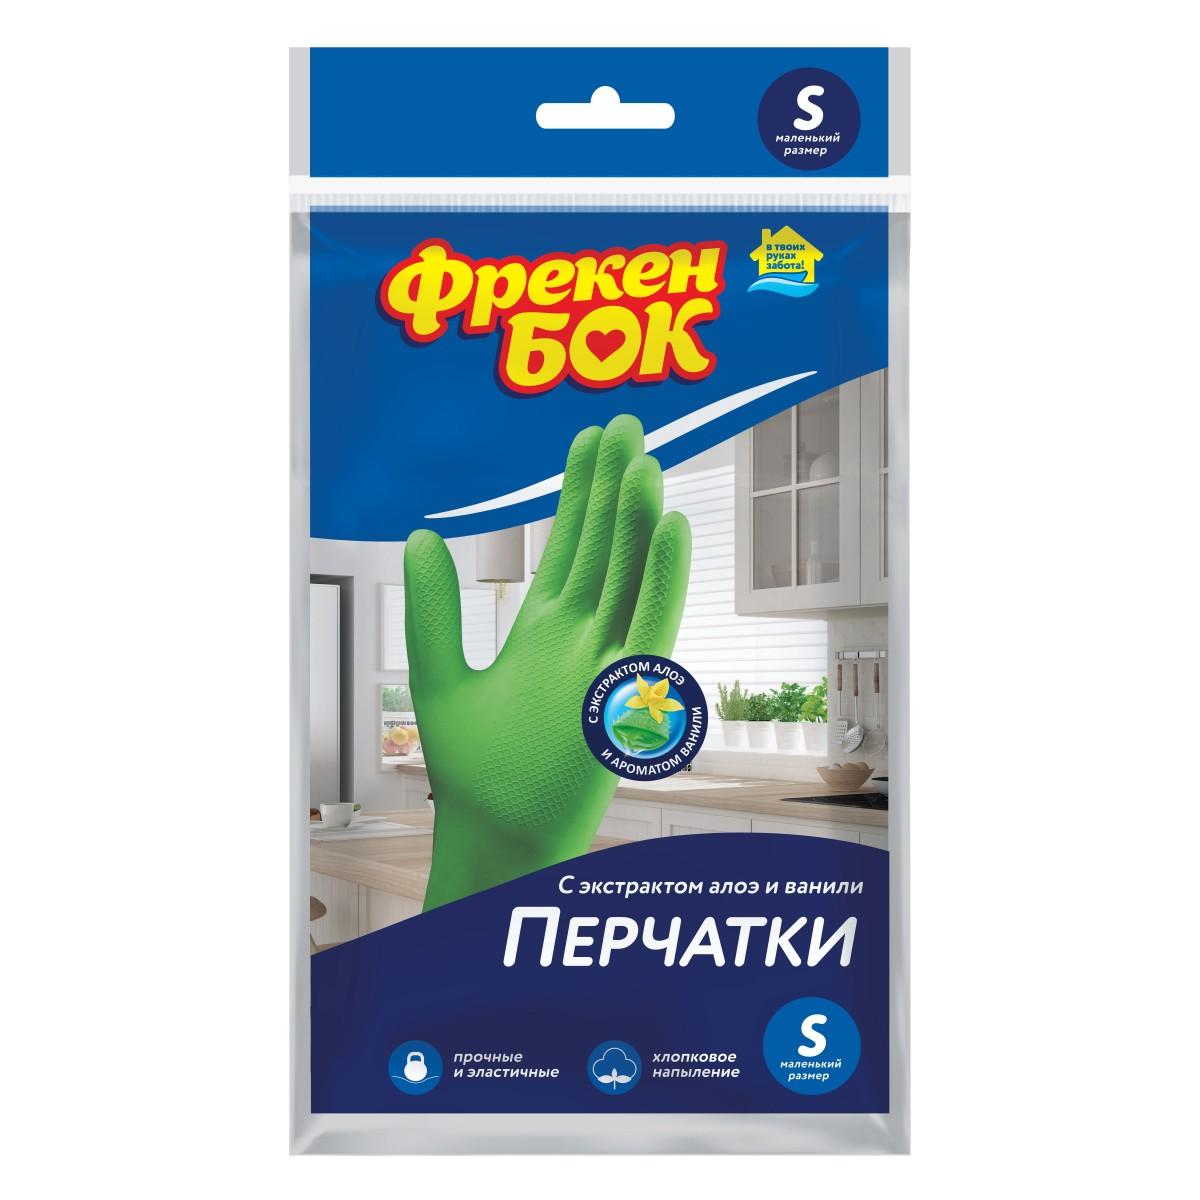 Перчатки хозяйственные Фрекен Бок латекс S